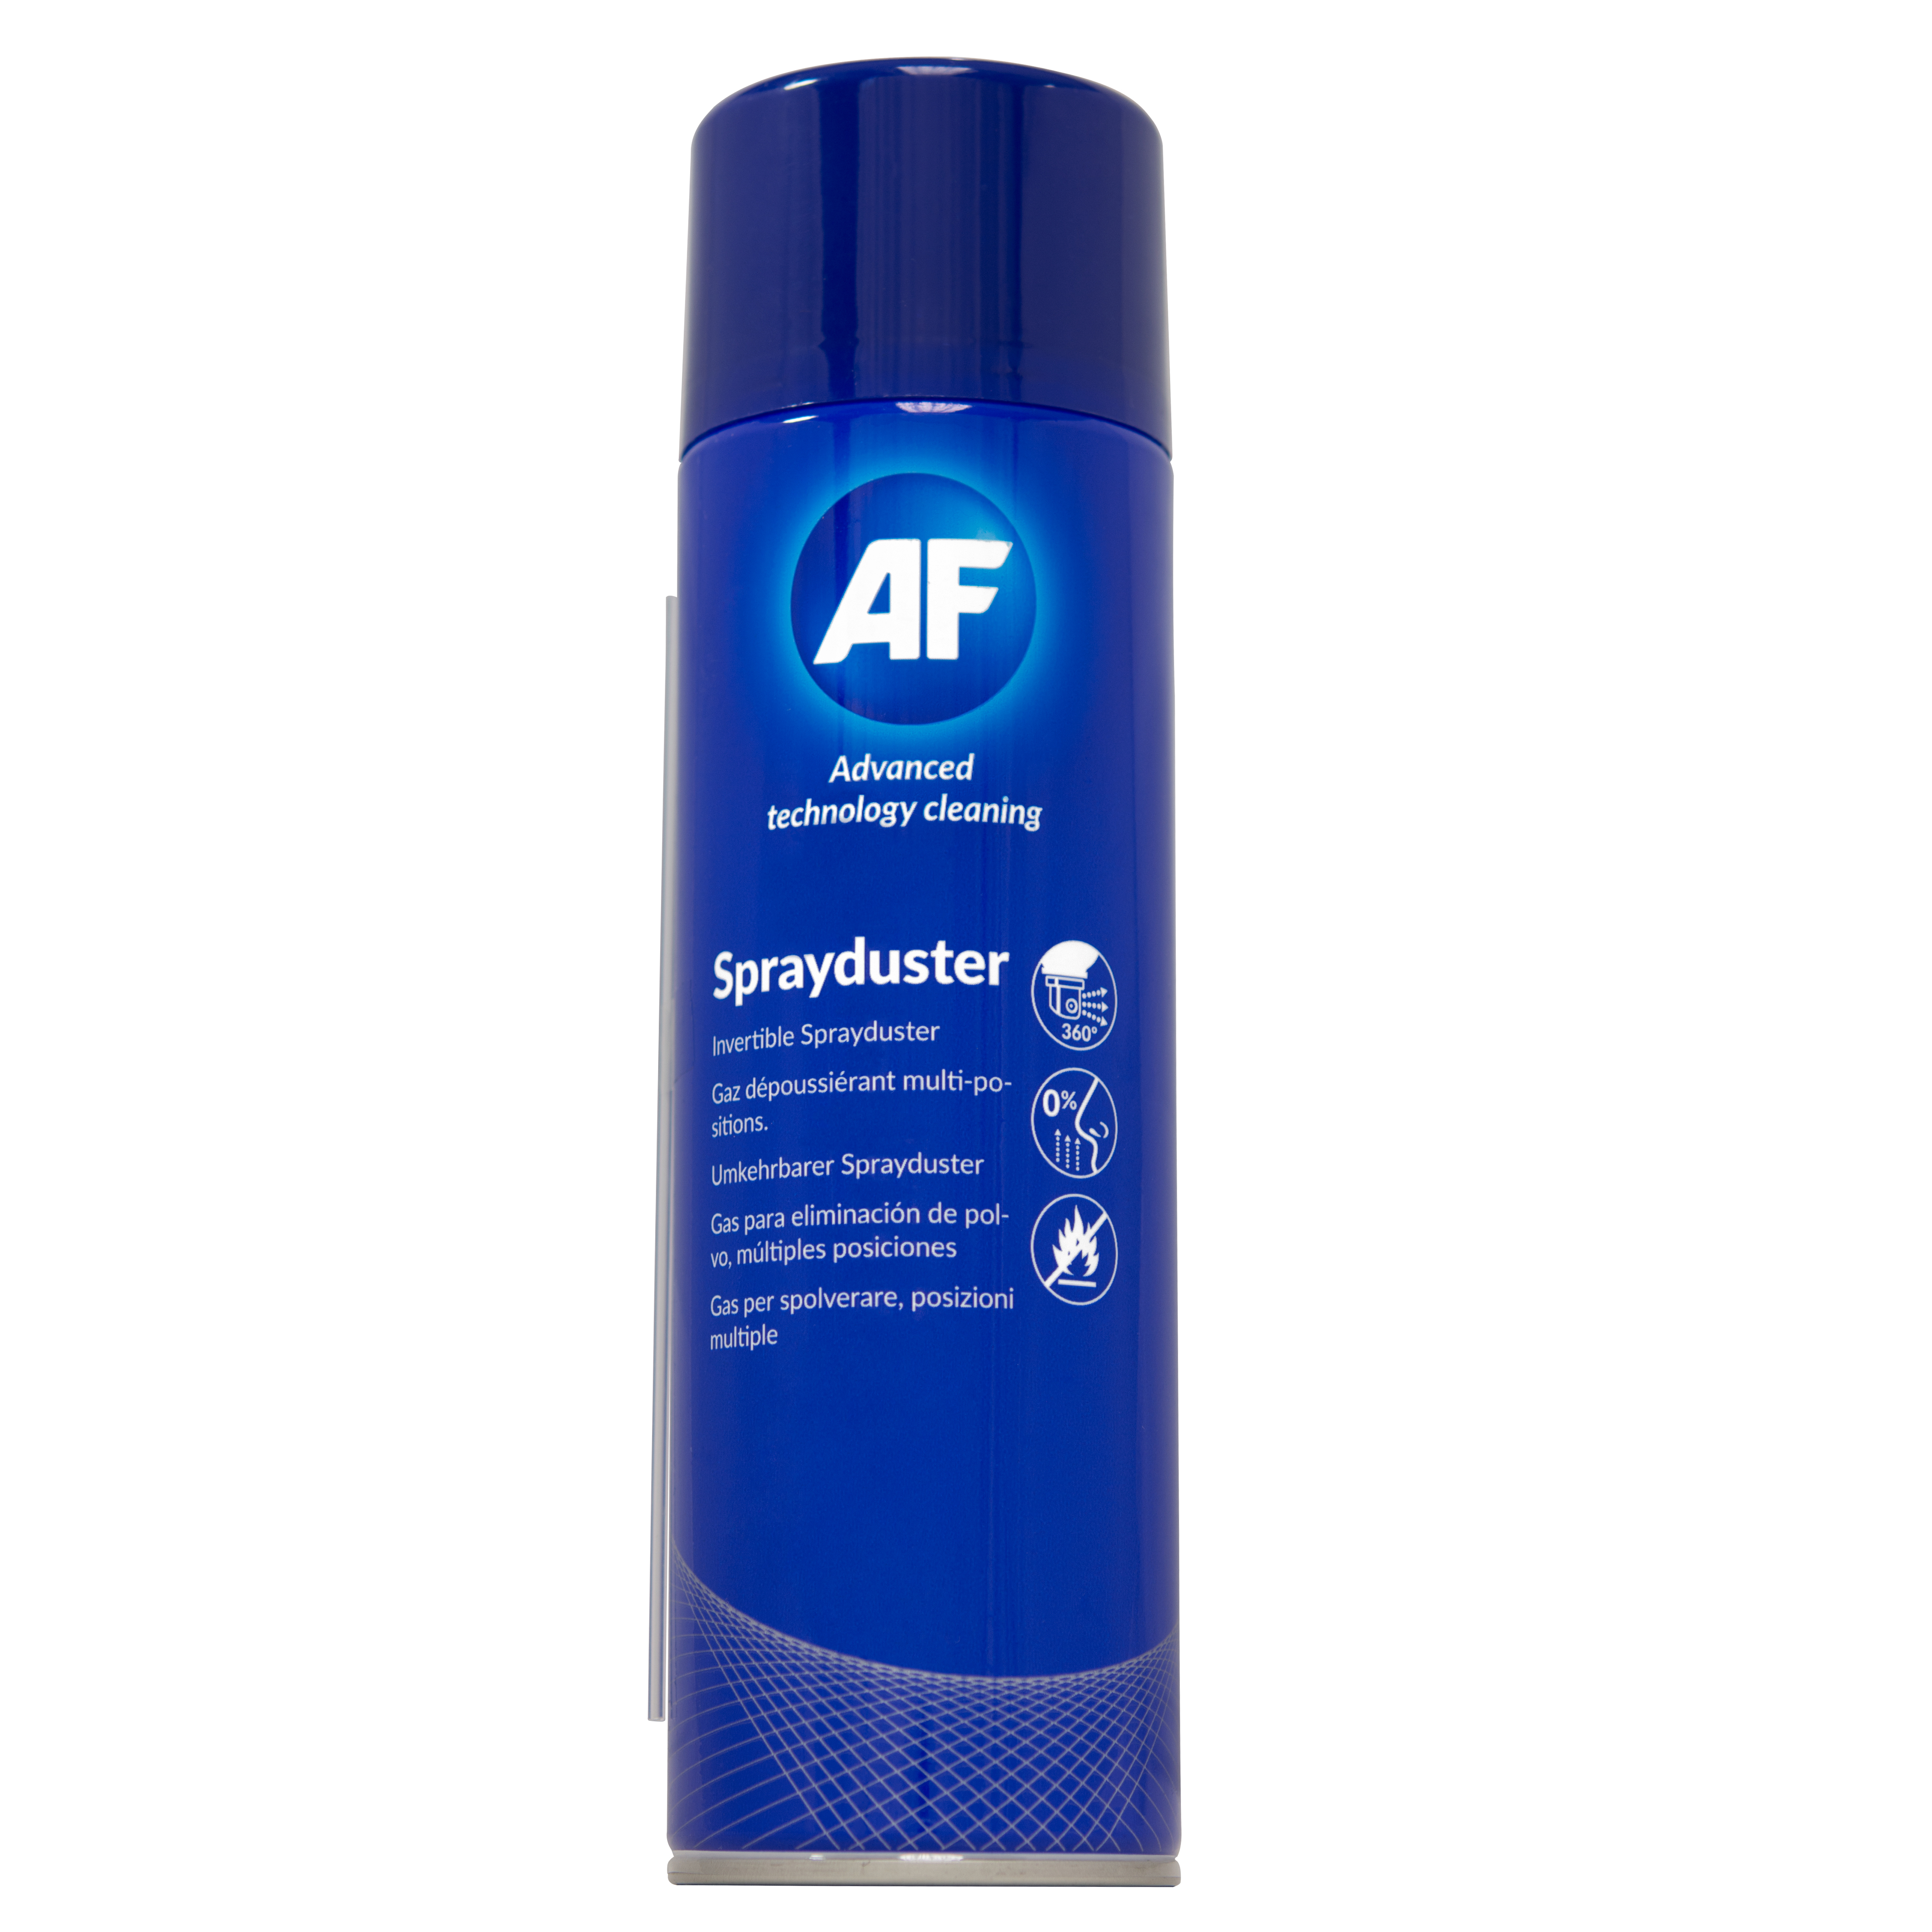 AF Sprayduster Invertible Air Duster 200ml ASDU200D